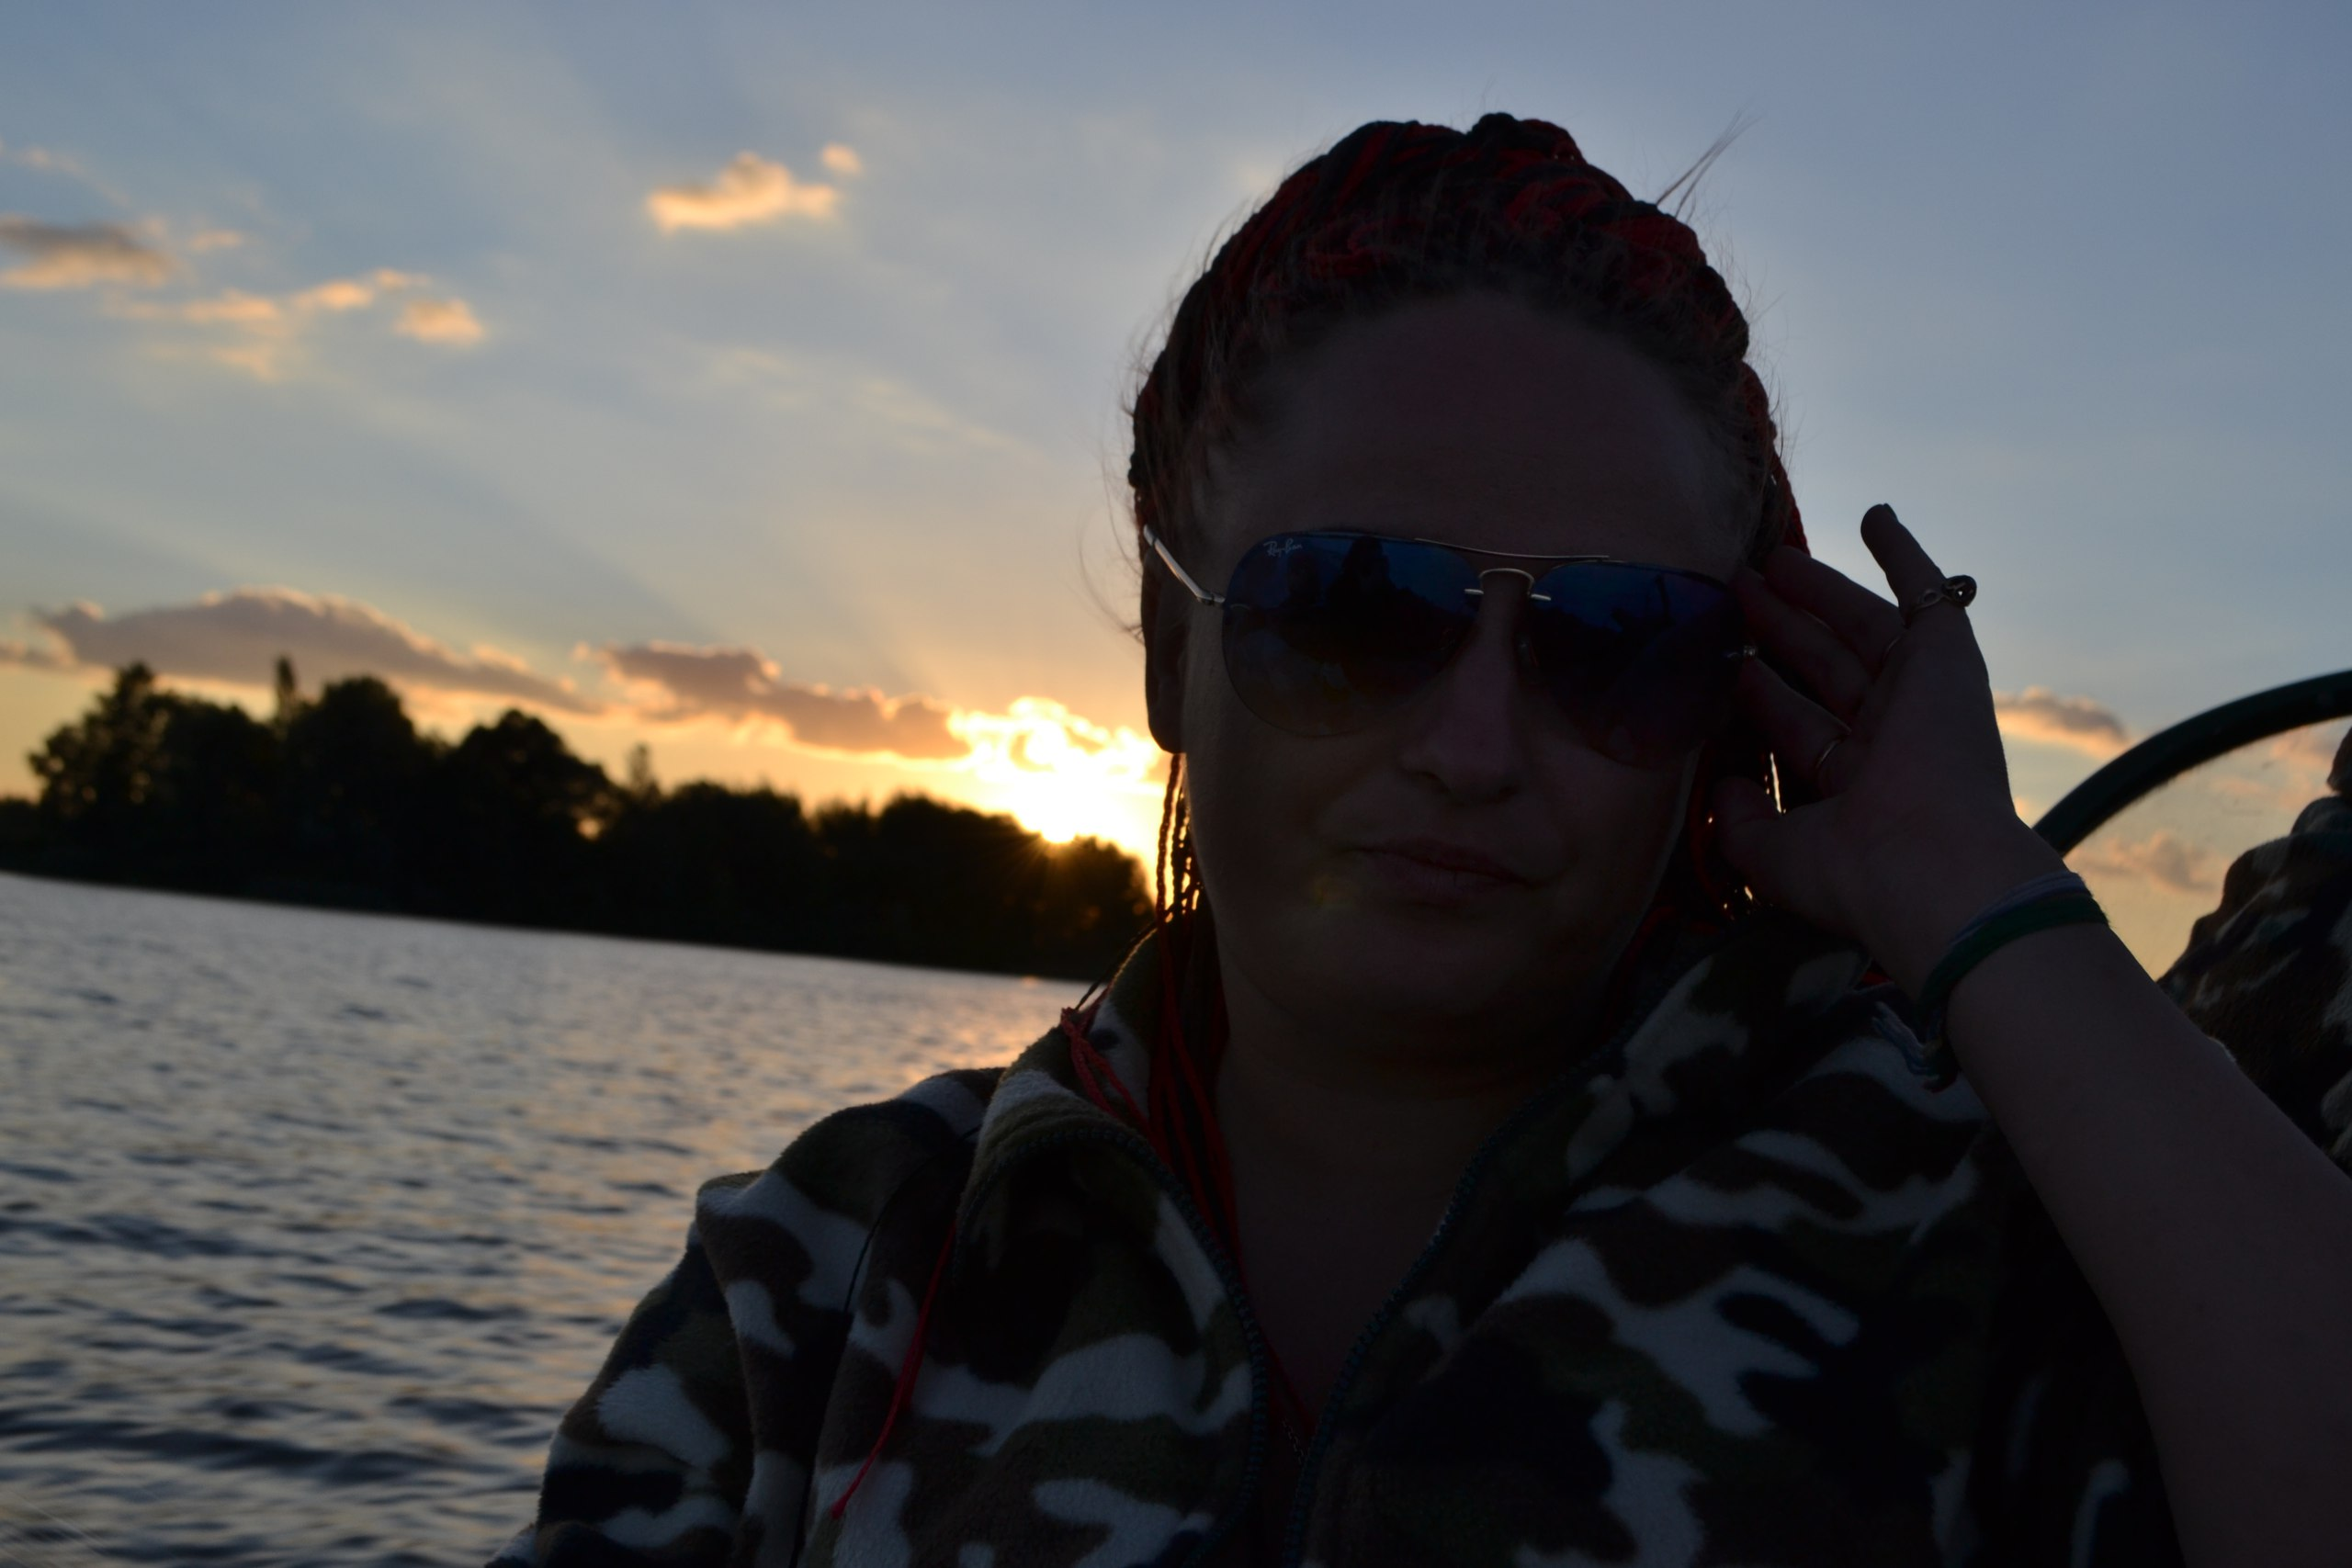 Елена Руденко Охота на водоплавающую дичь ( Украинка. 24-25 августа. 2016 г.) - Страница 3 EX7J6Q4-_OI